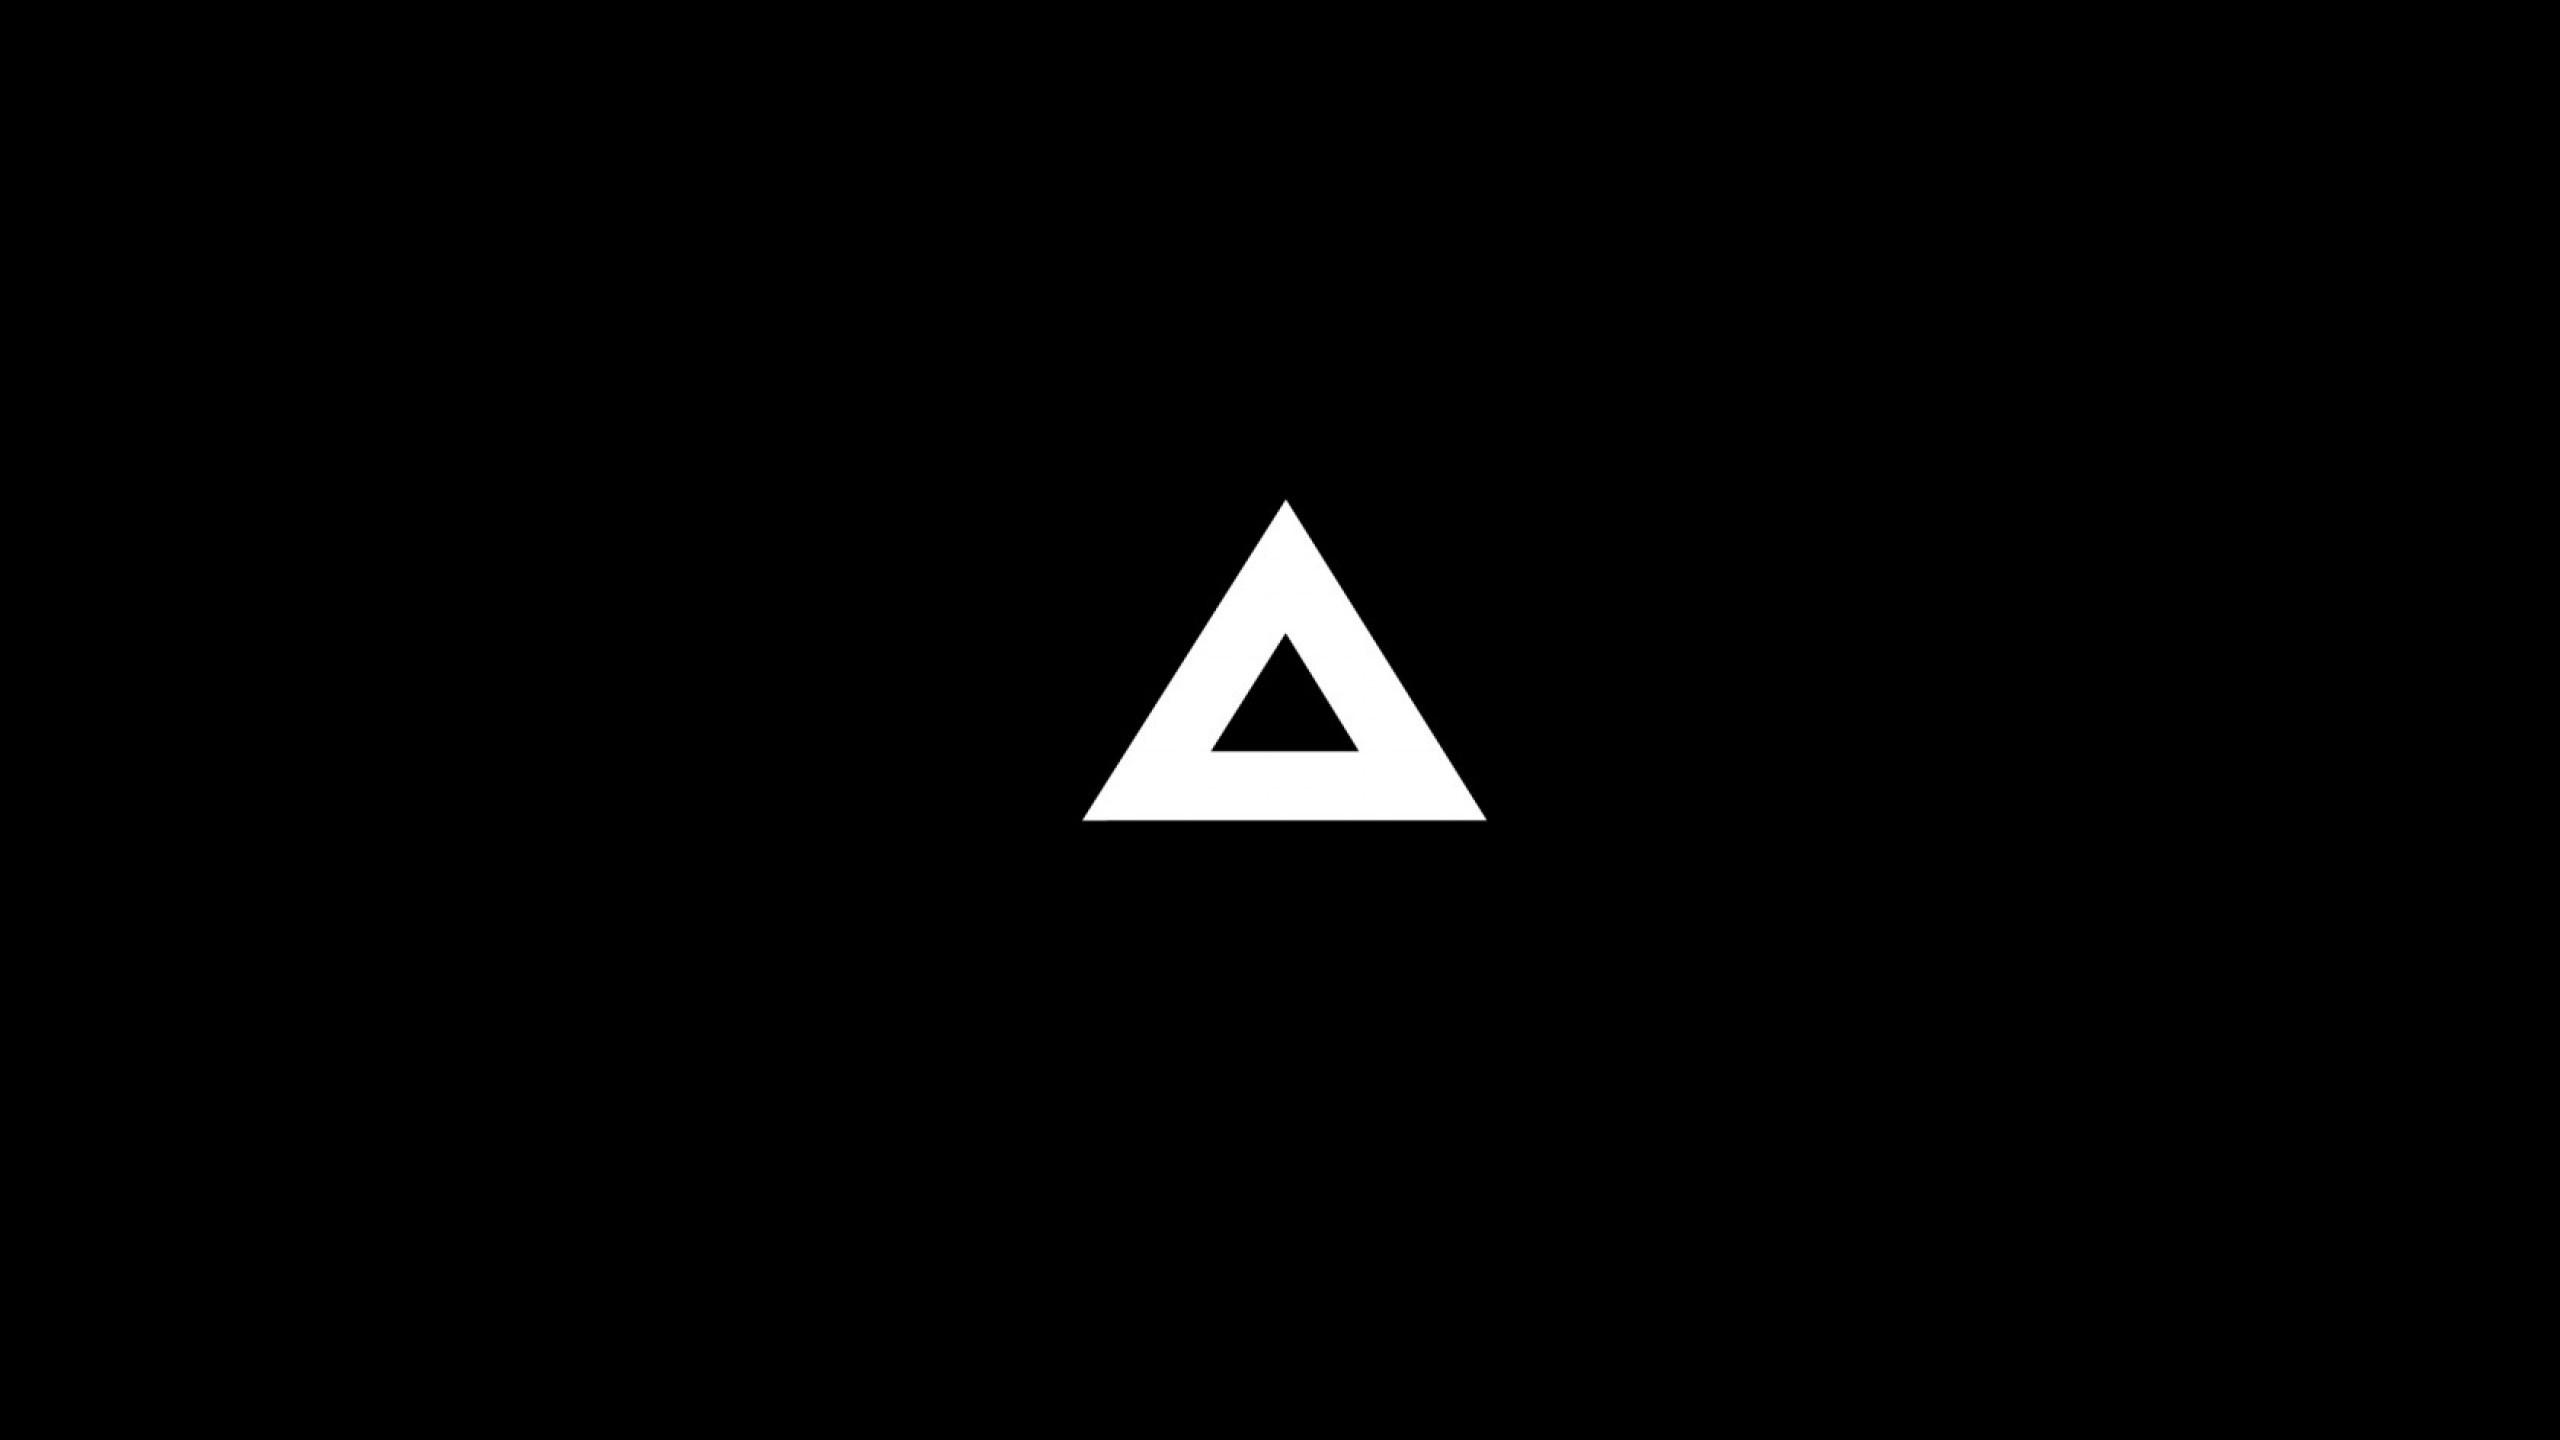 Wallpaper triangle, minimalism, black, white